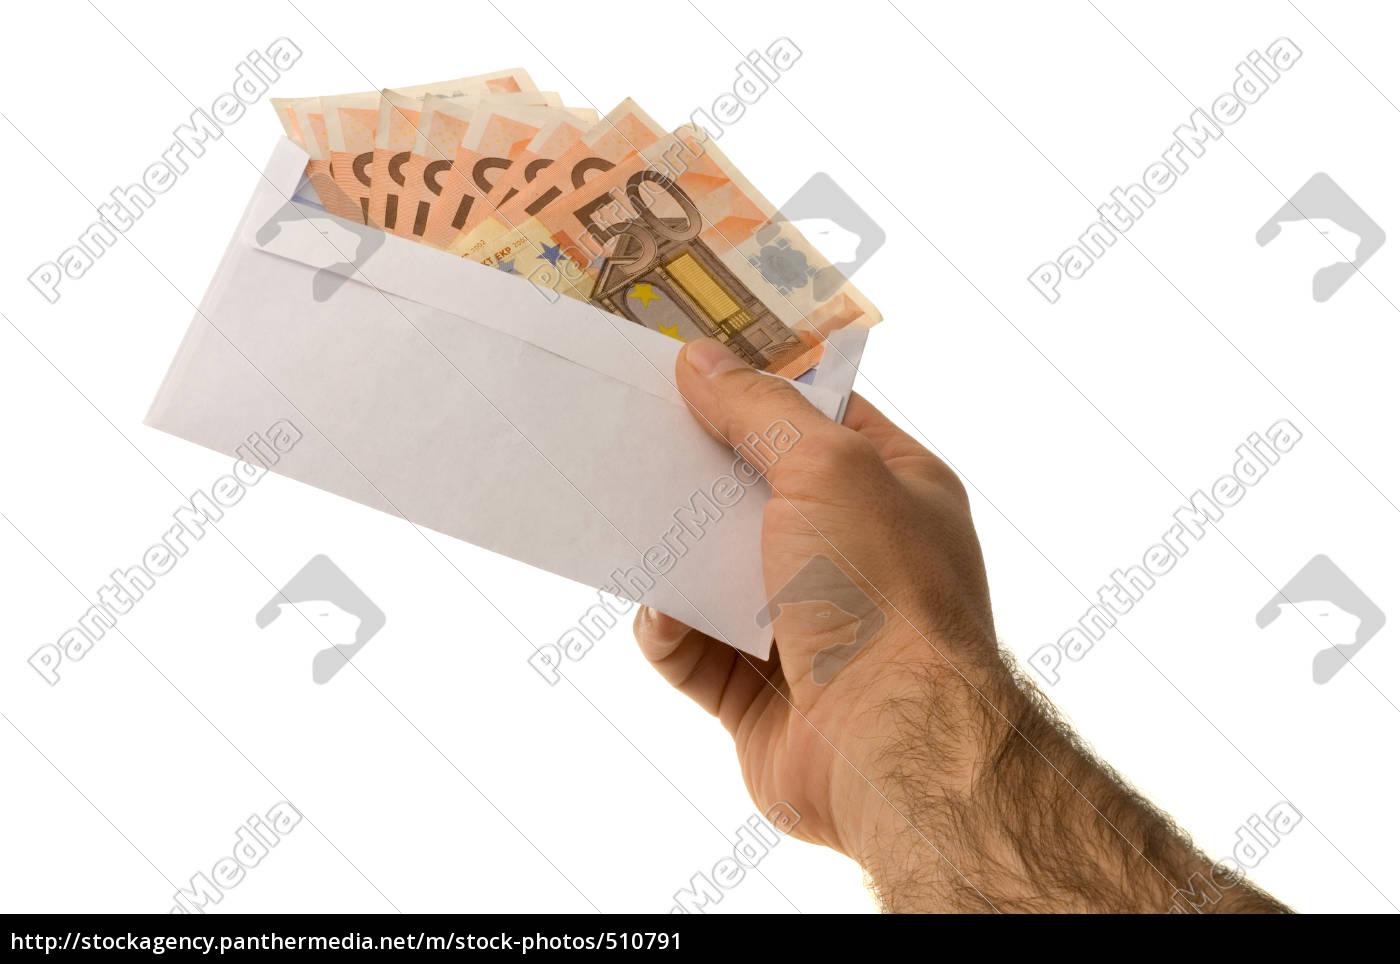 bribery - 510791